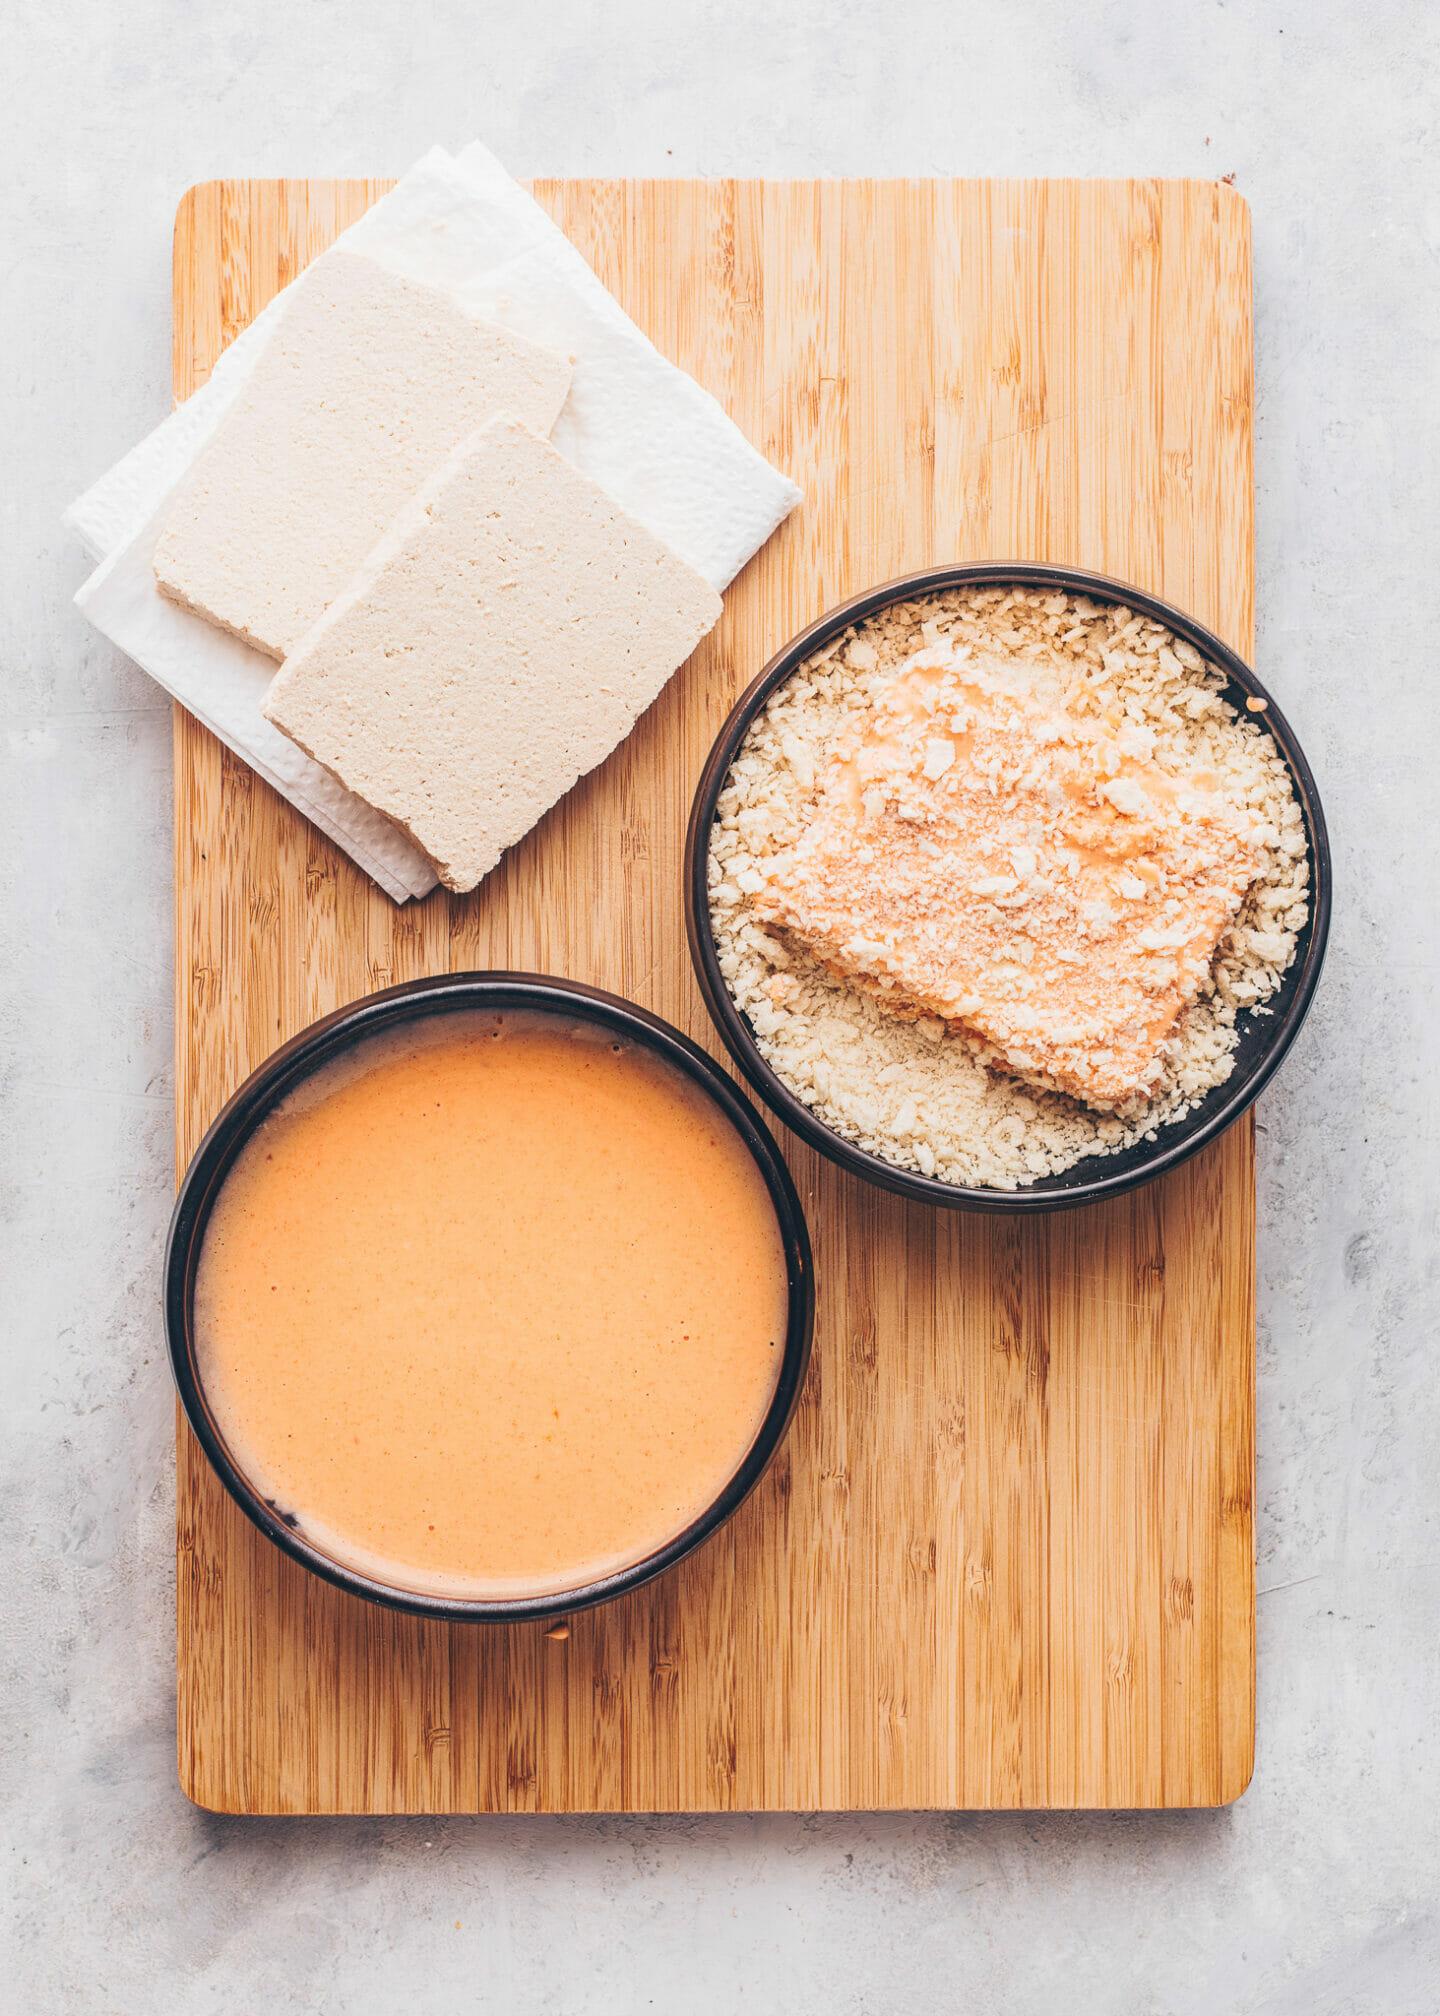 How to make Tofu Steaks (Vegan Katsu)